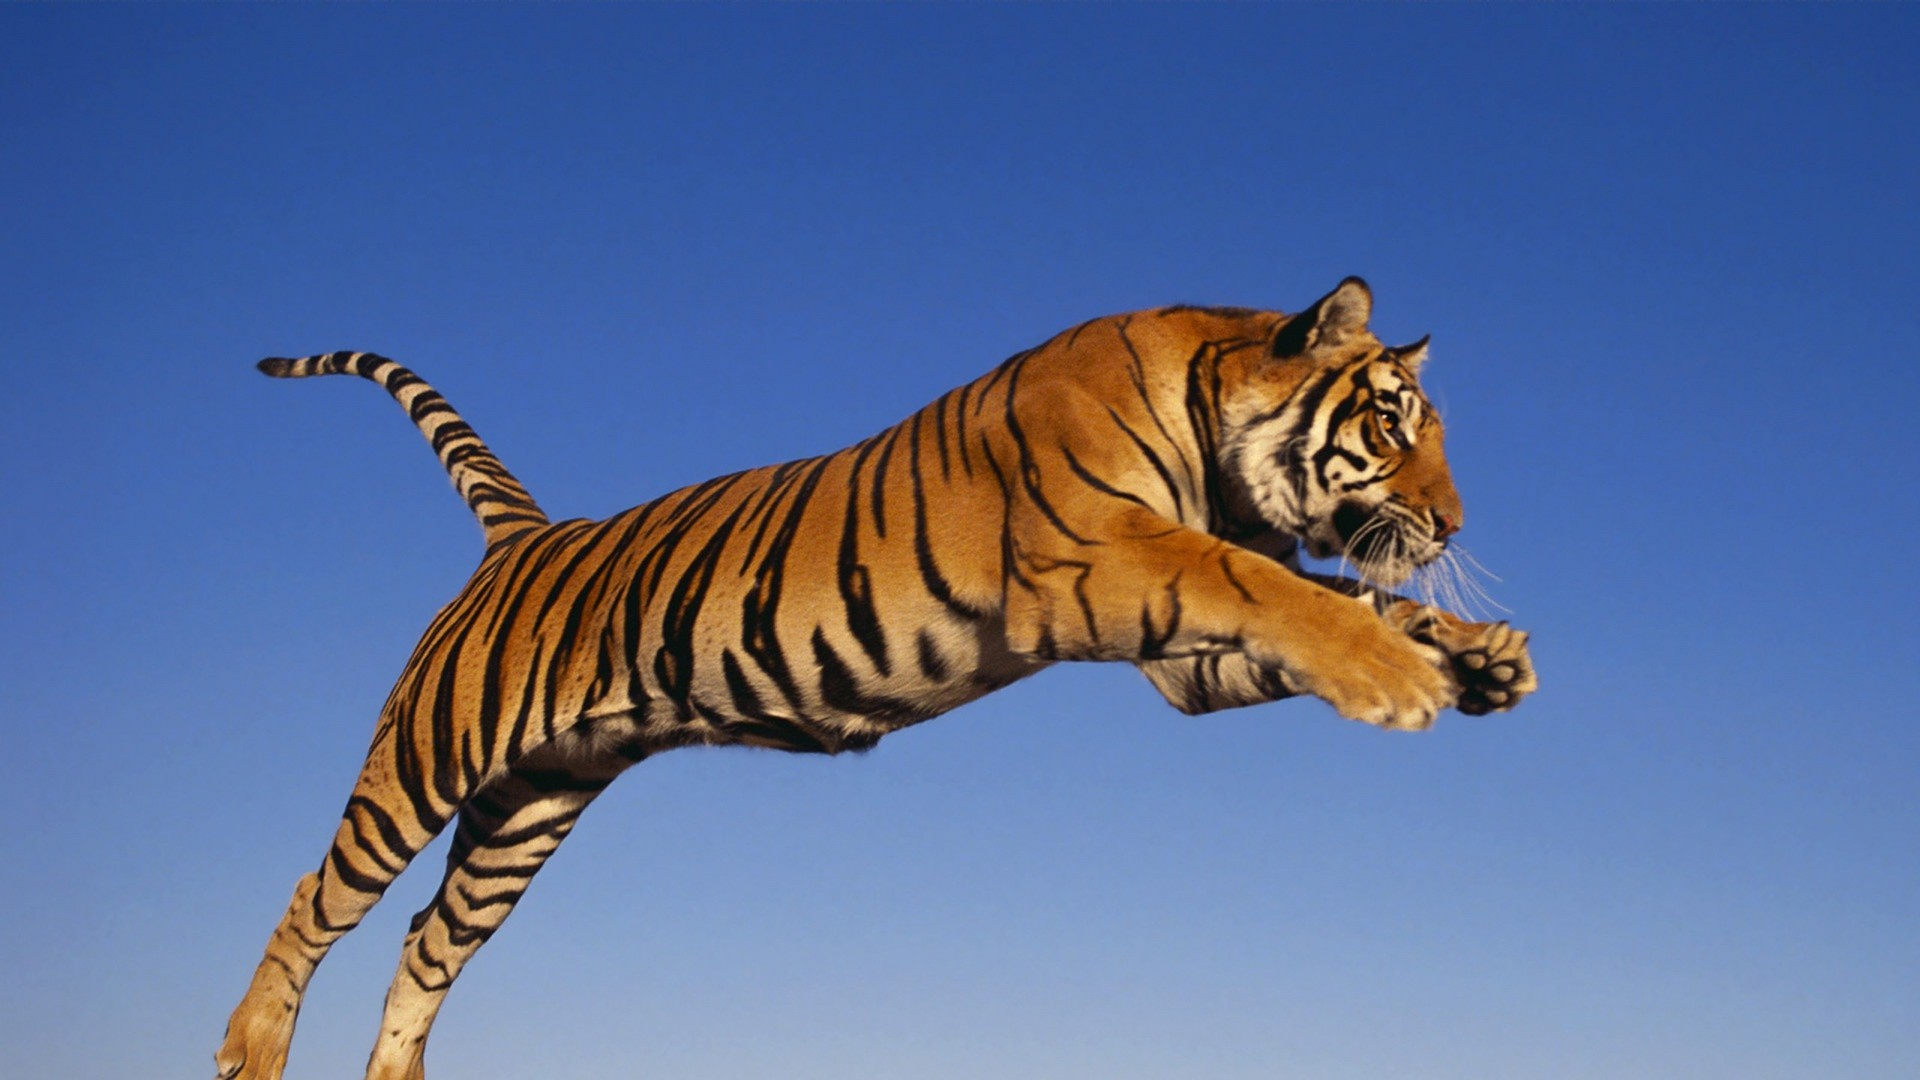 … Background Full HD 1080p. Wallpaper tiger, jump, predator